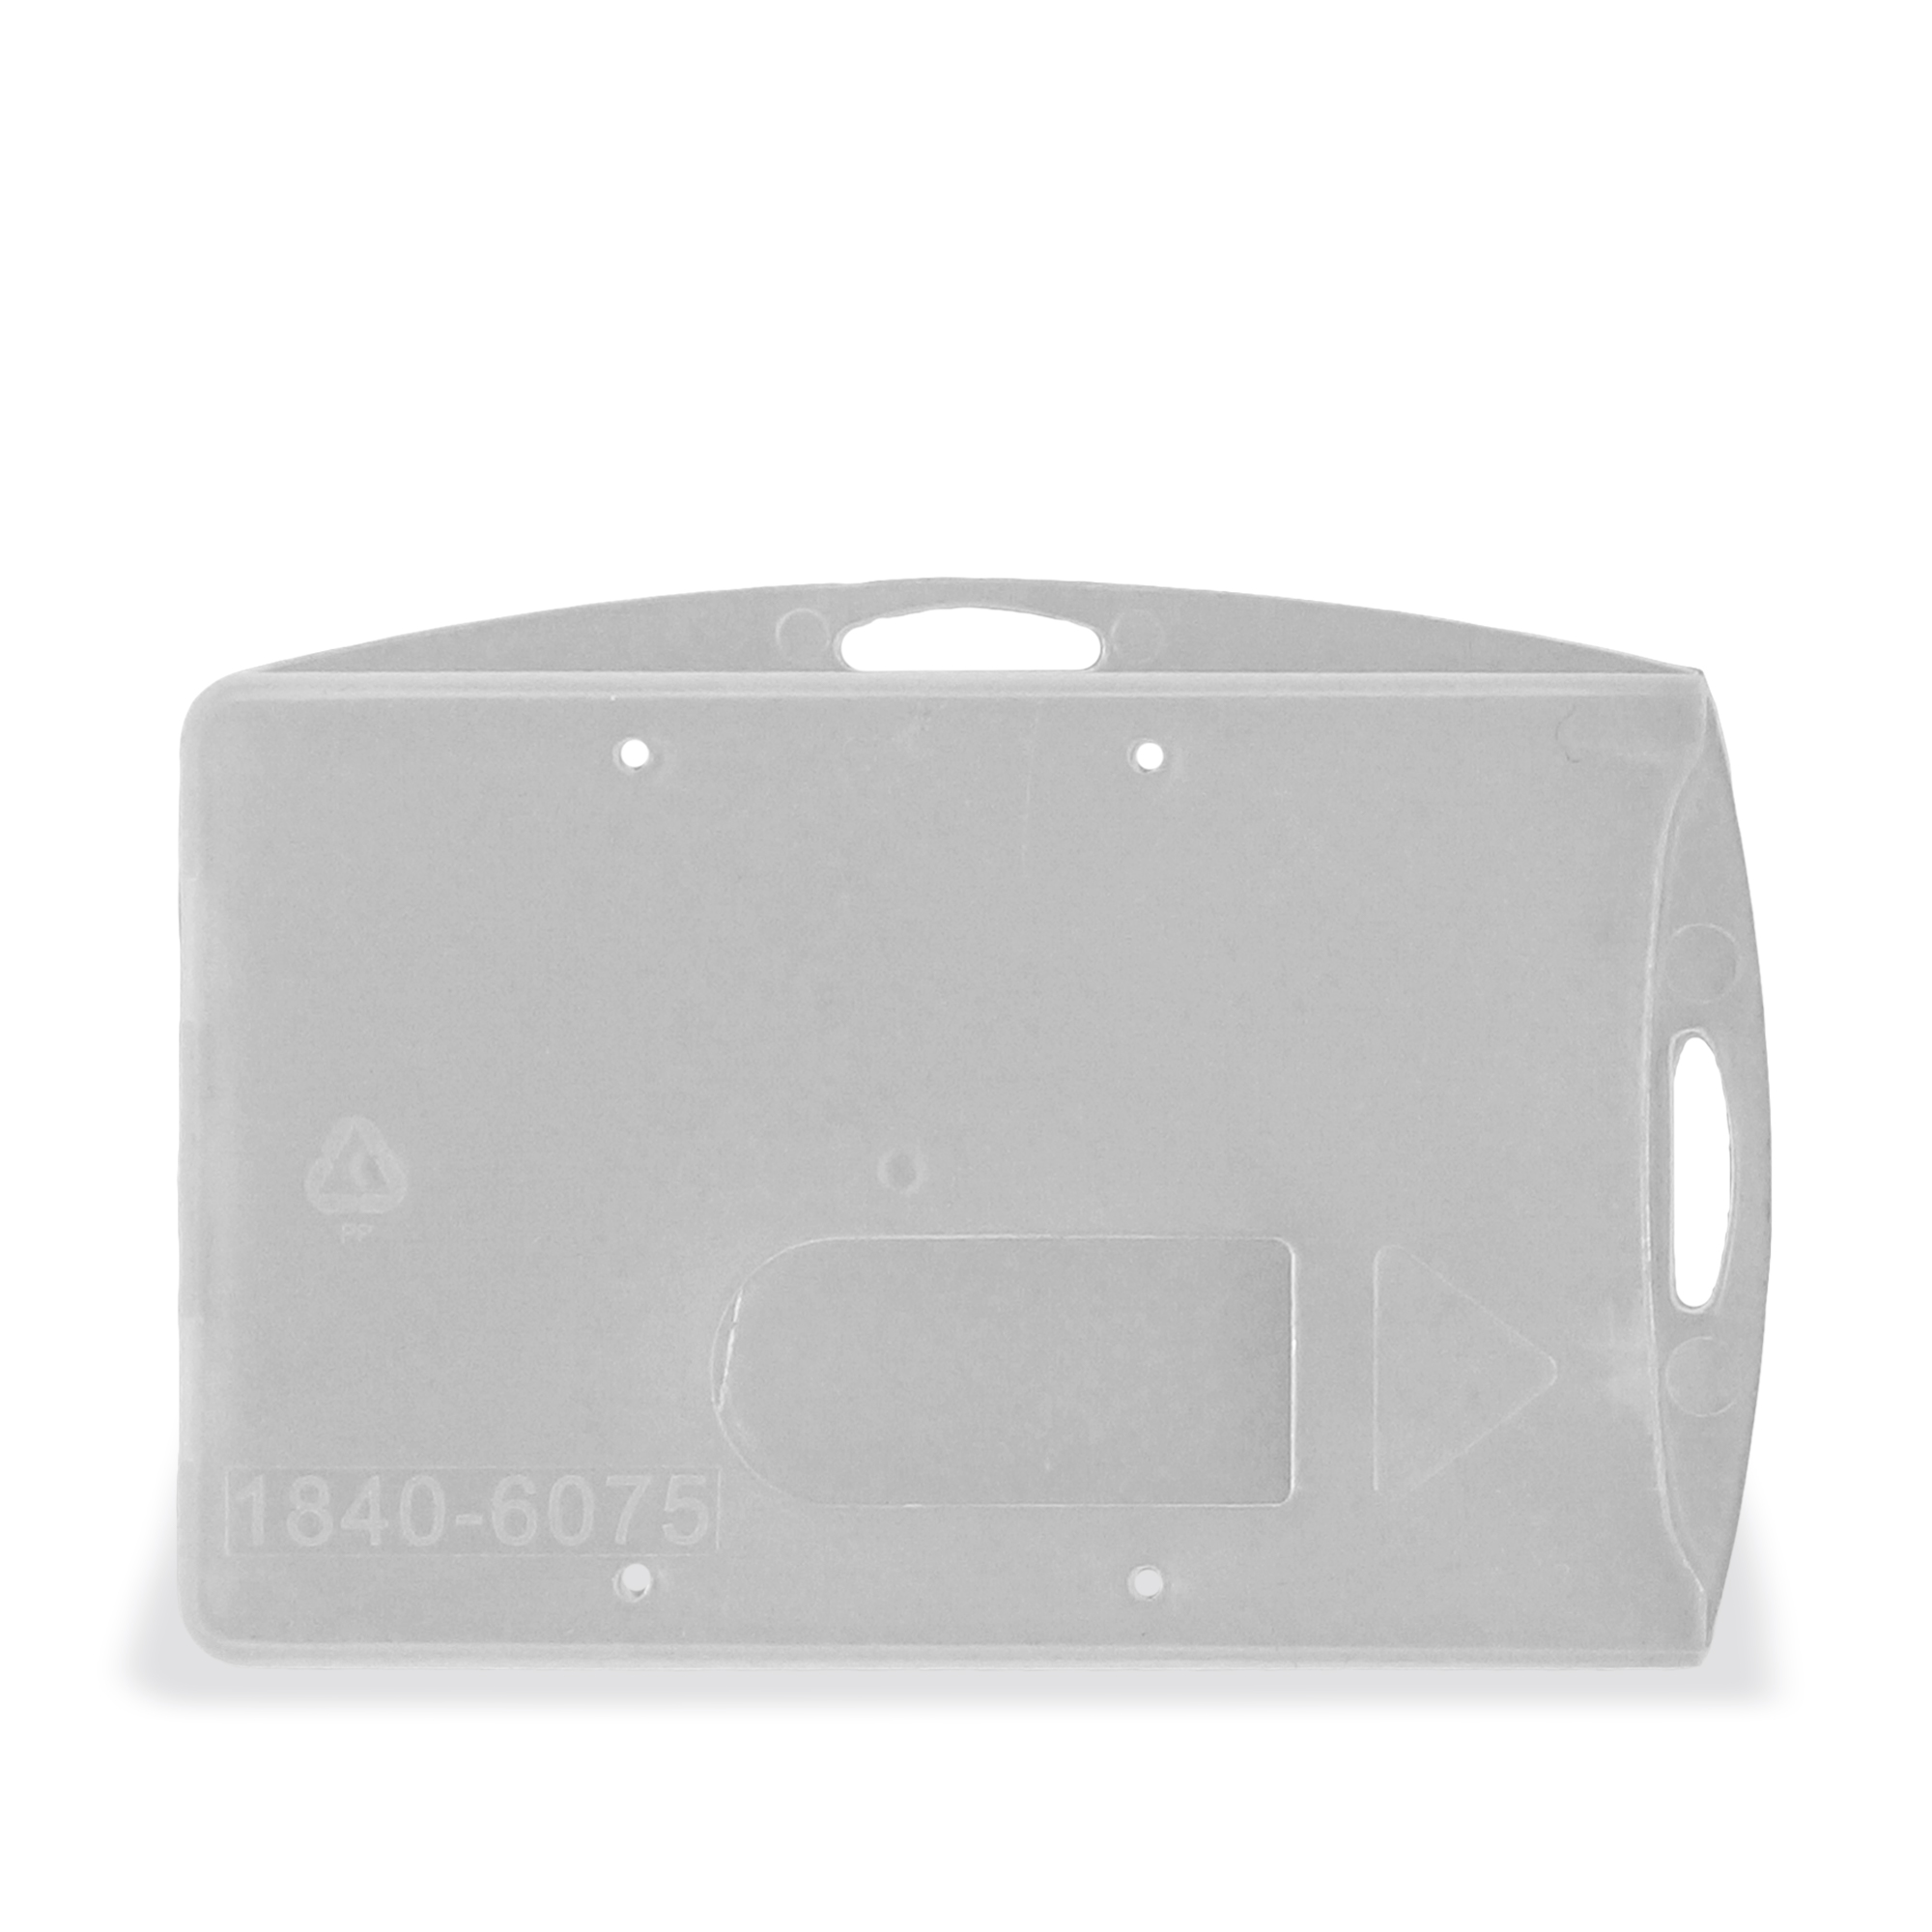 0dba248987d OV-chipkaart hoesje transparant - OV Accessoires - OVshop.nl